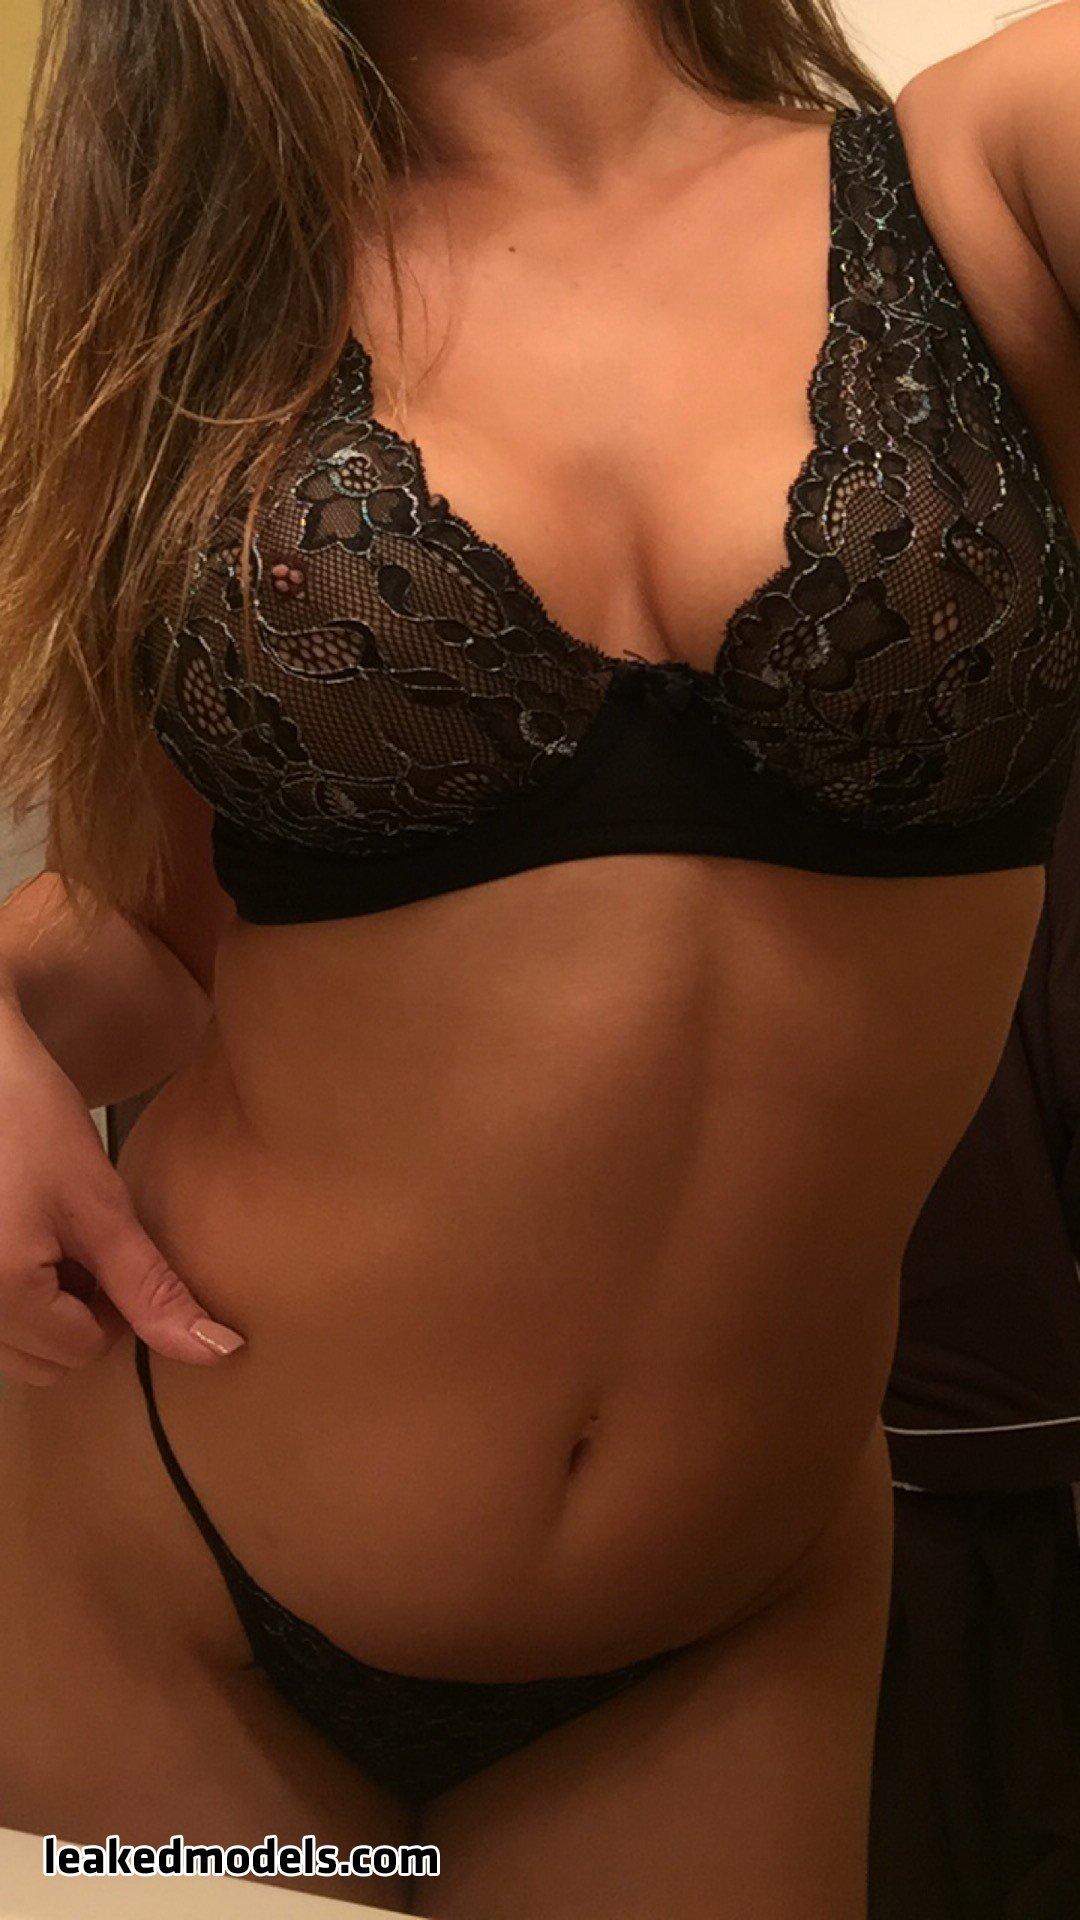 Erin Ashford Instagram Sexy Leaks (33 Photos)